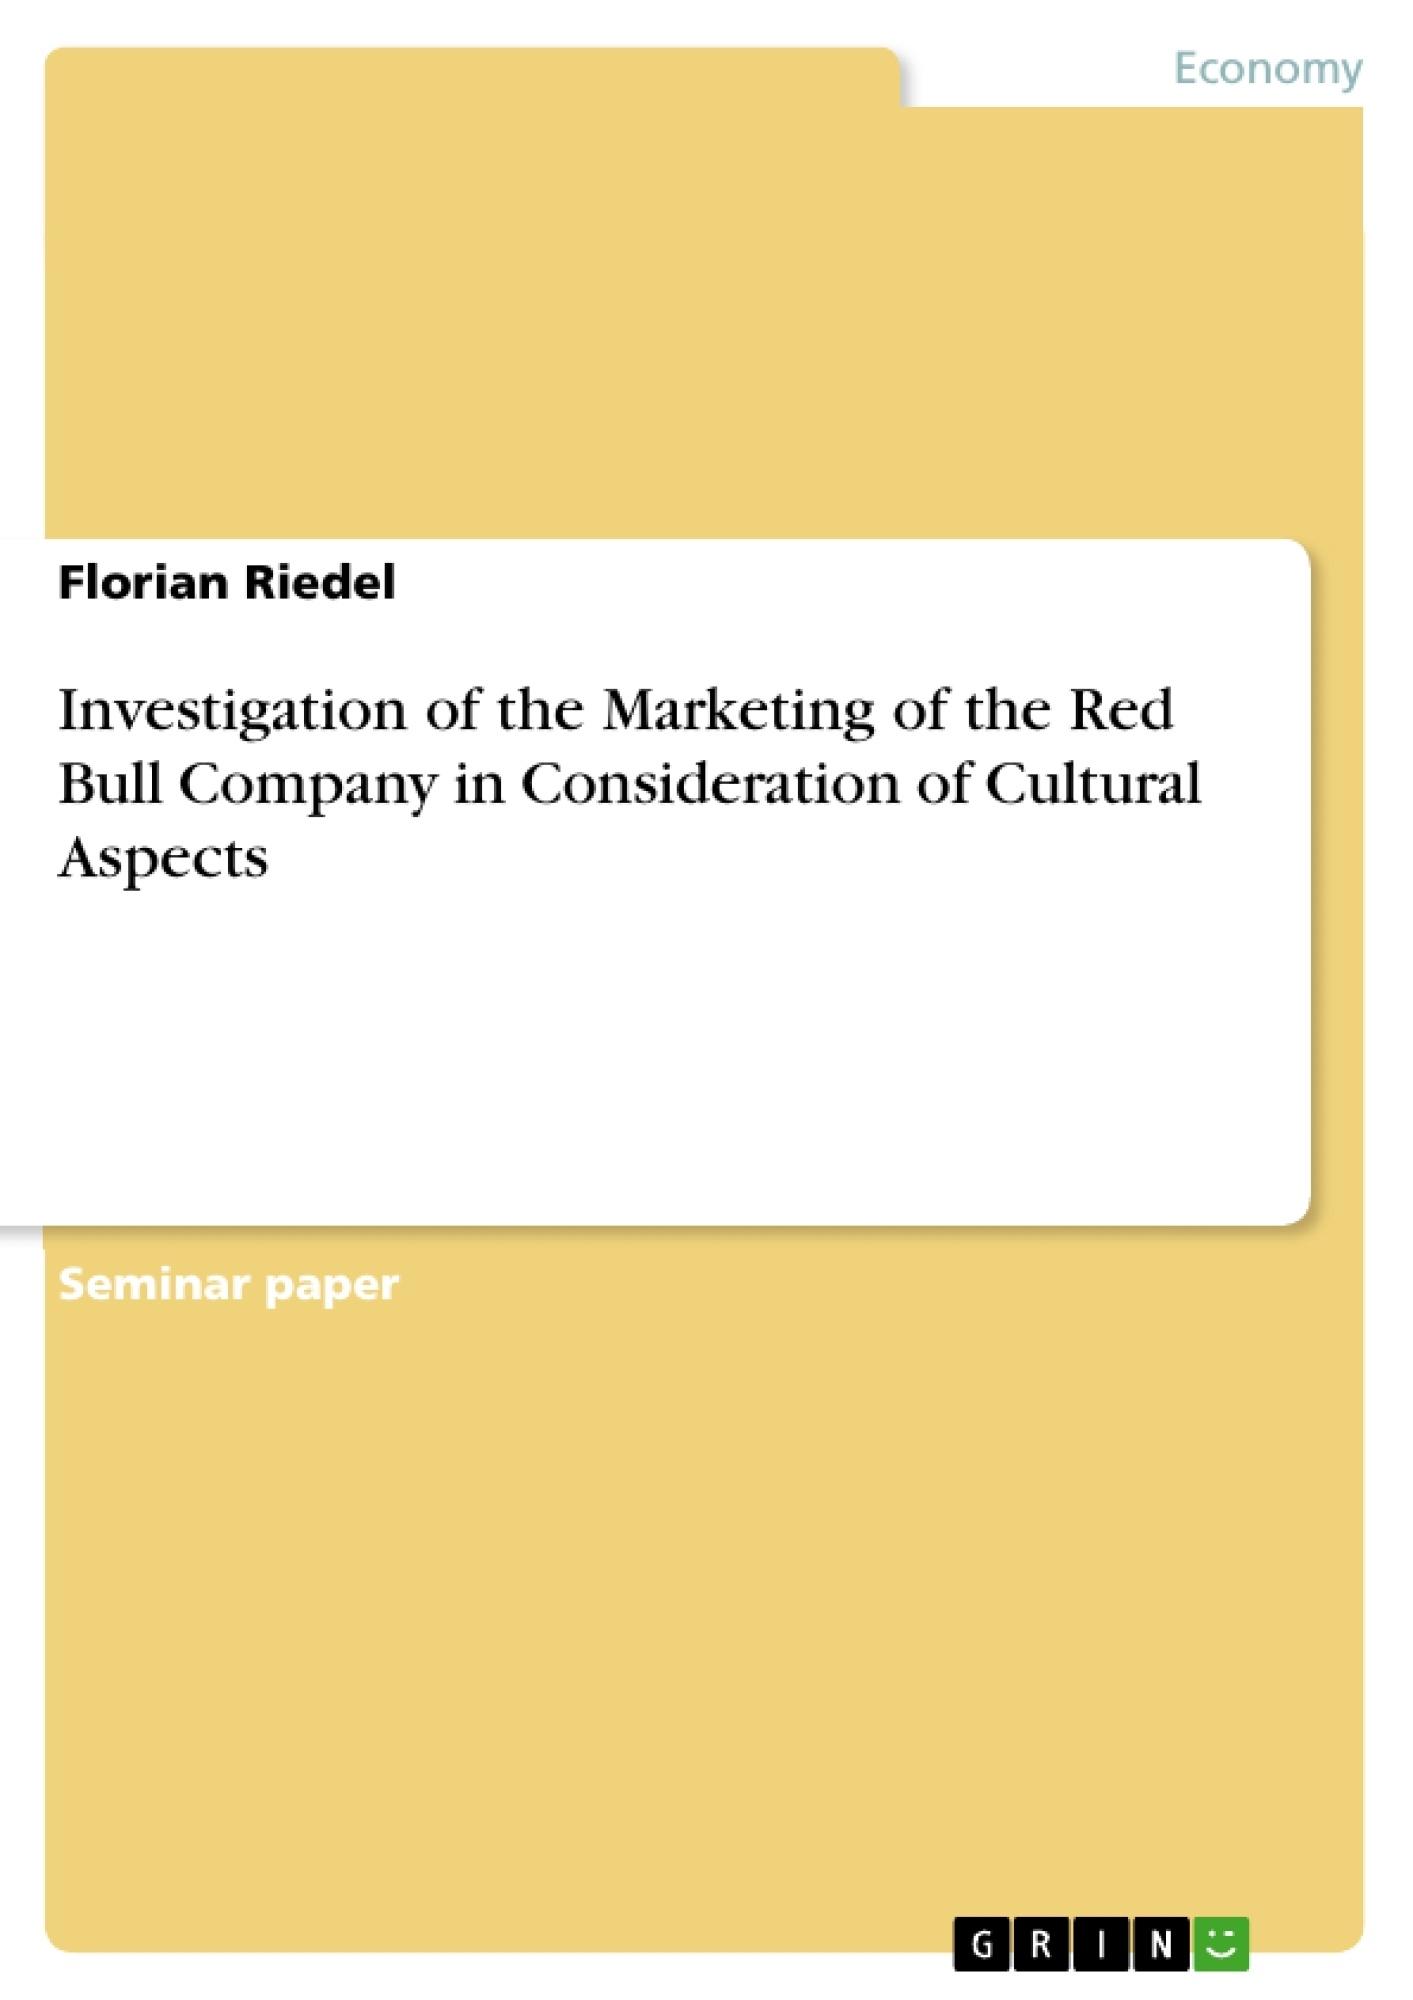 Bachelor thesis red bull